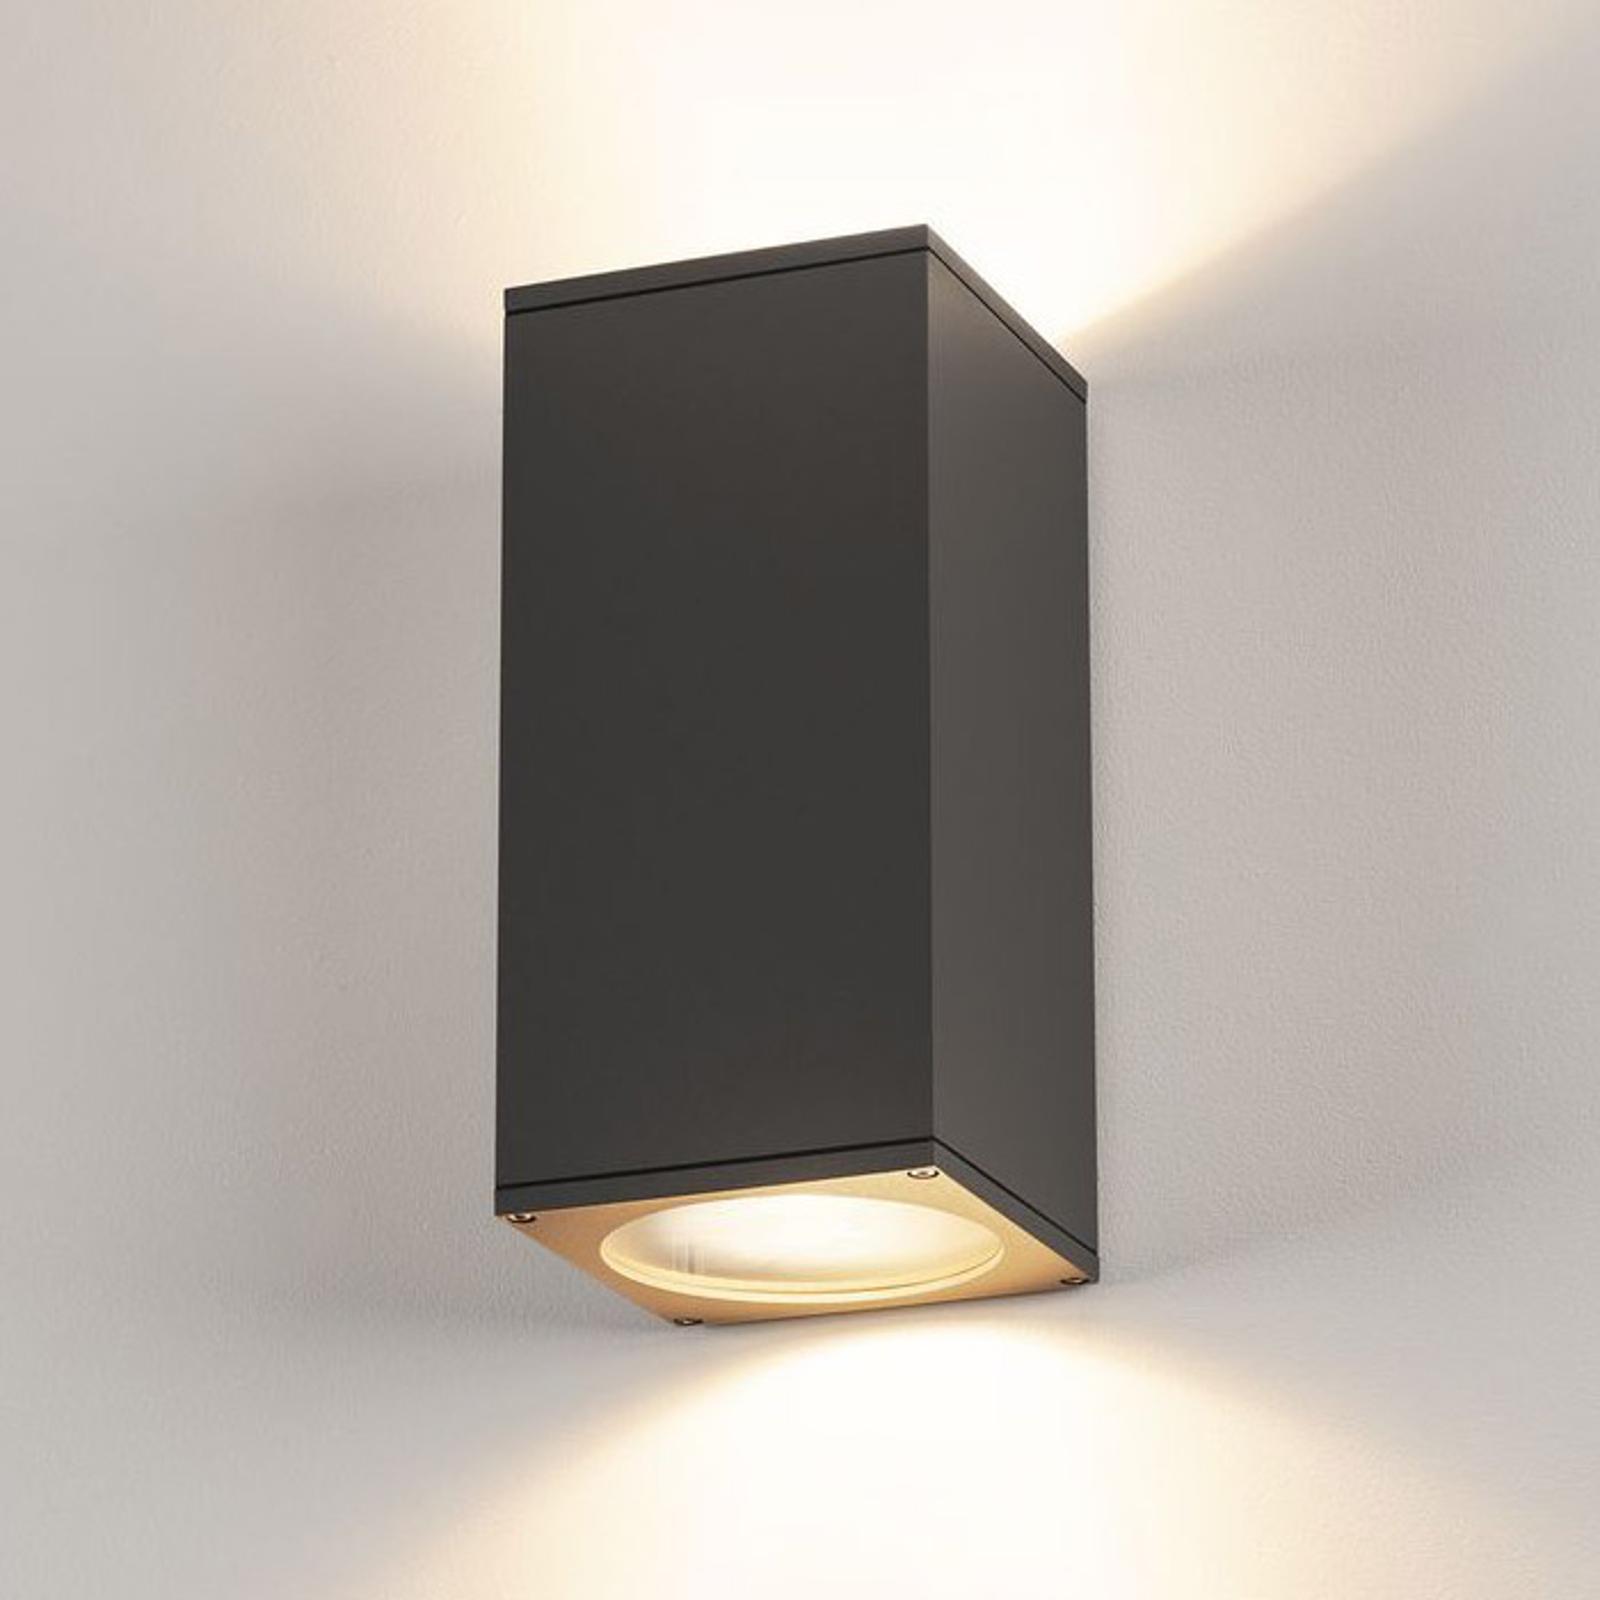 SLV Big Theo Außenwandlampe, 2fl, anthrazit